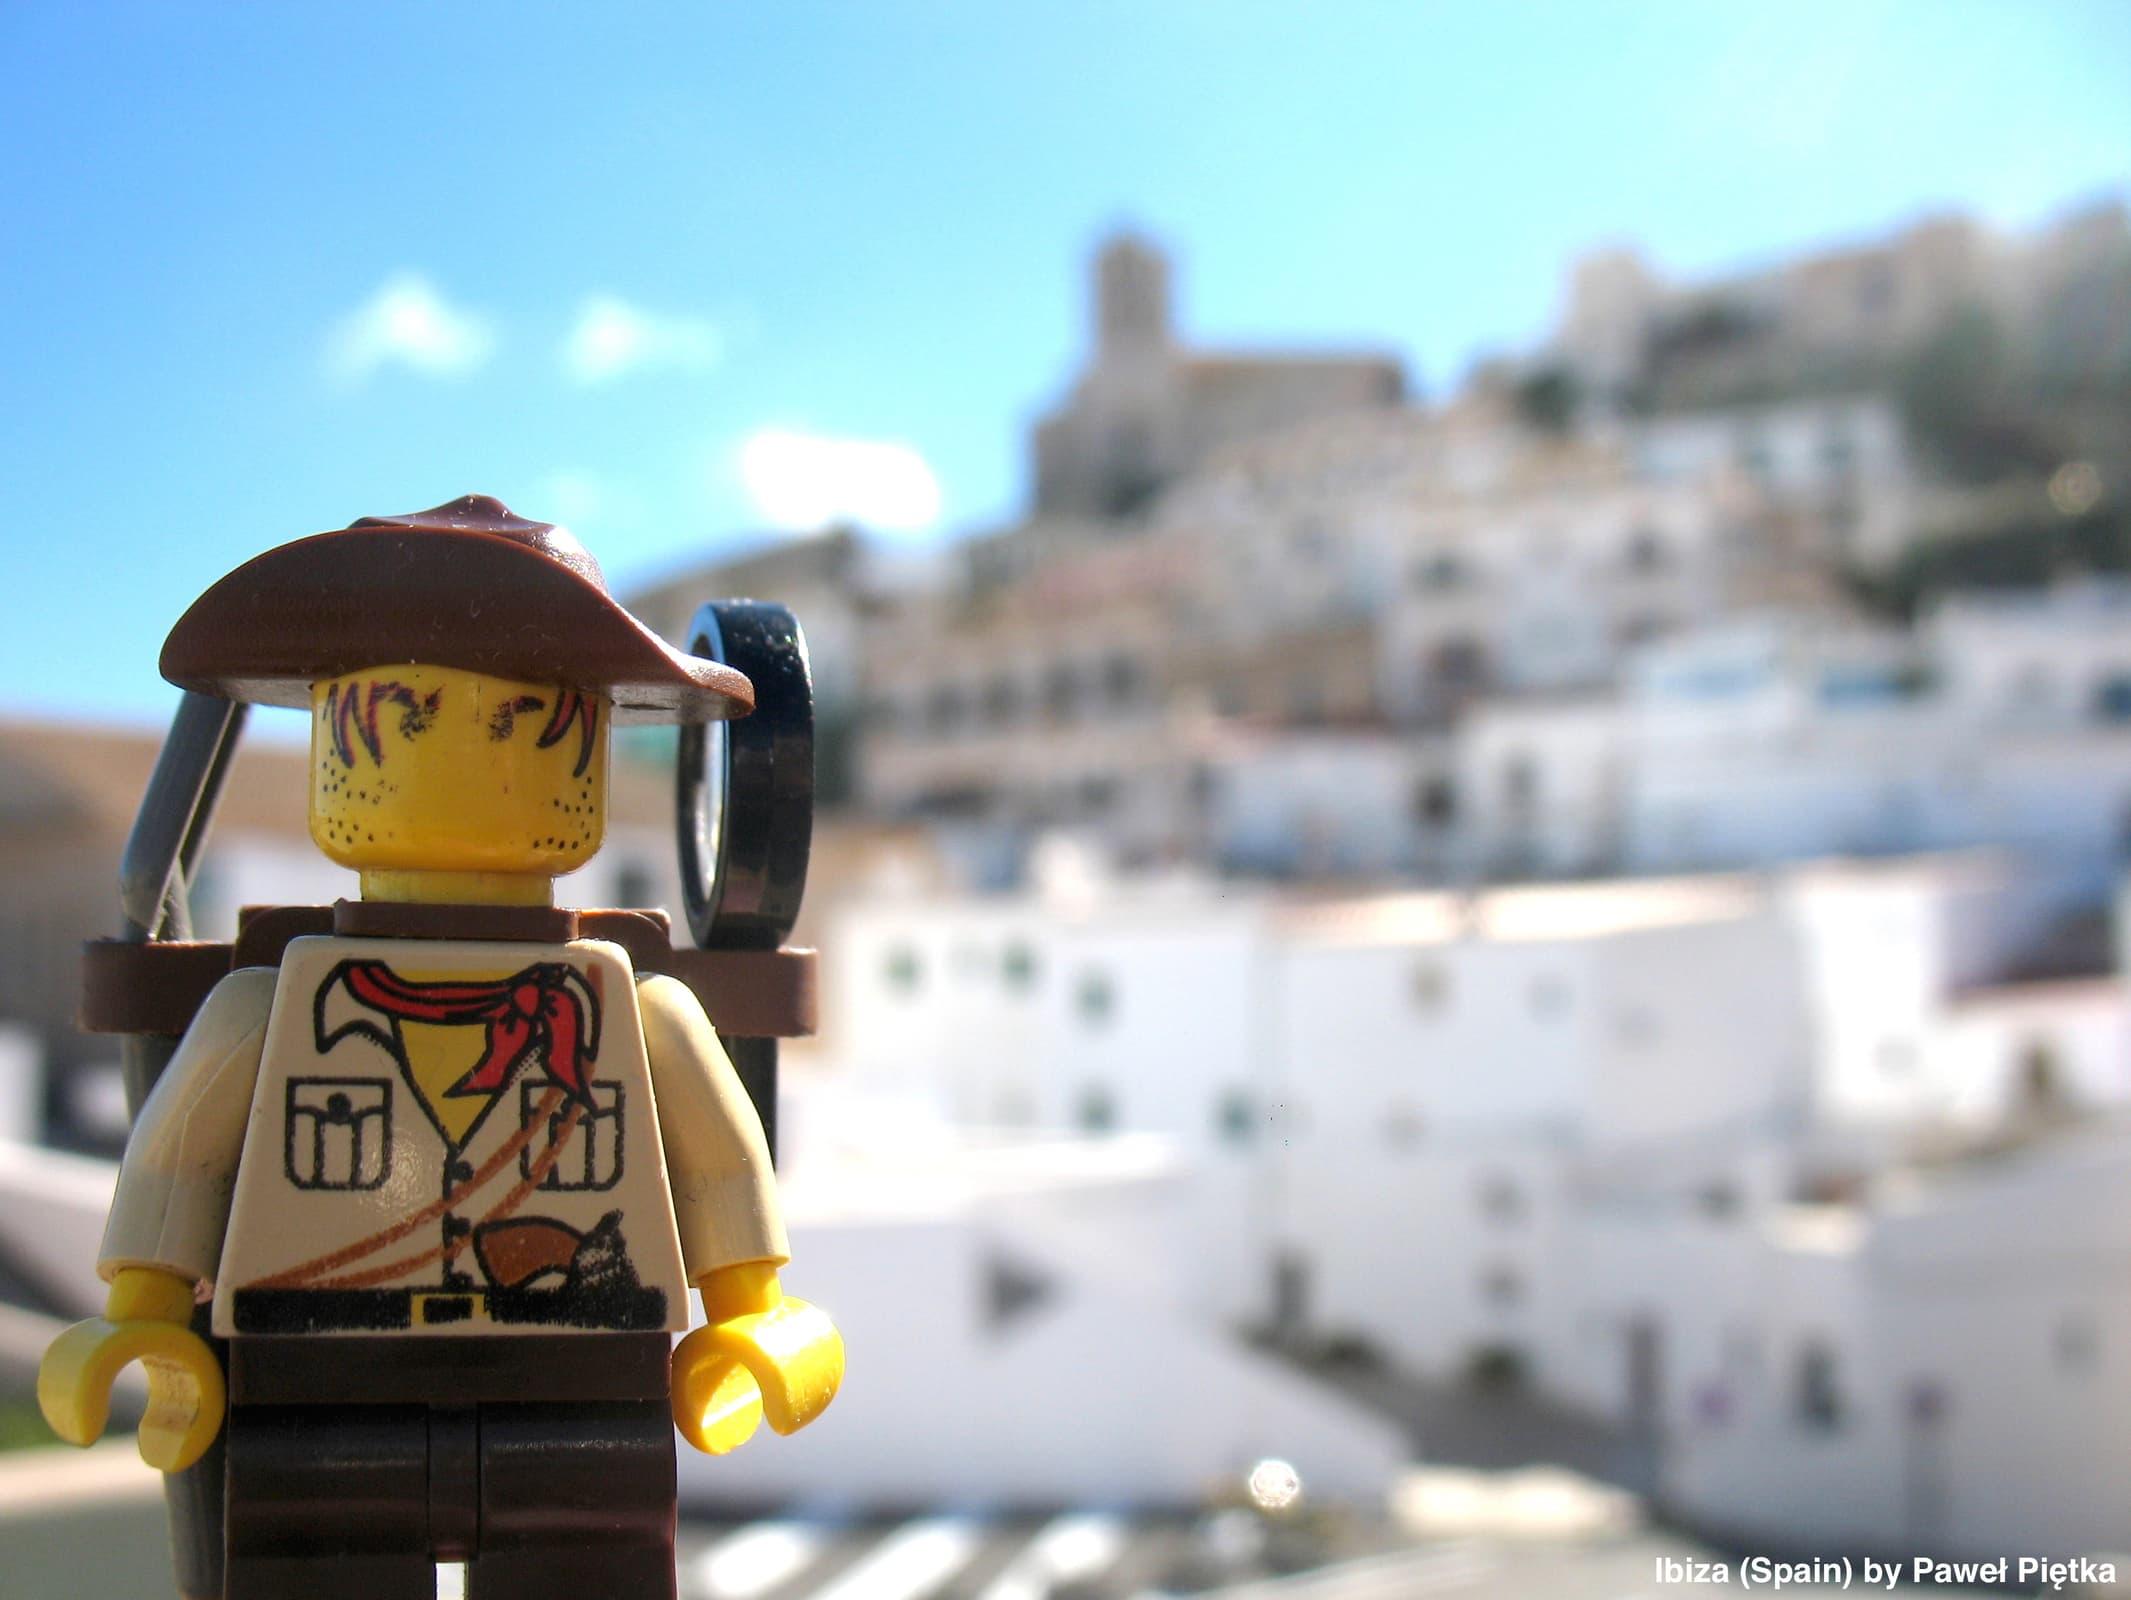 Ibiza (Spain) - Old city of Ibiza Town